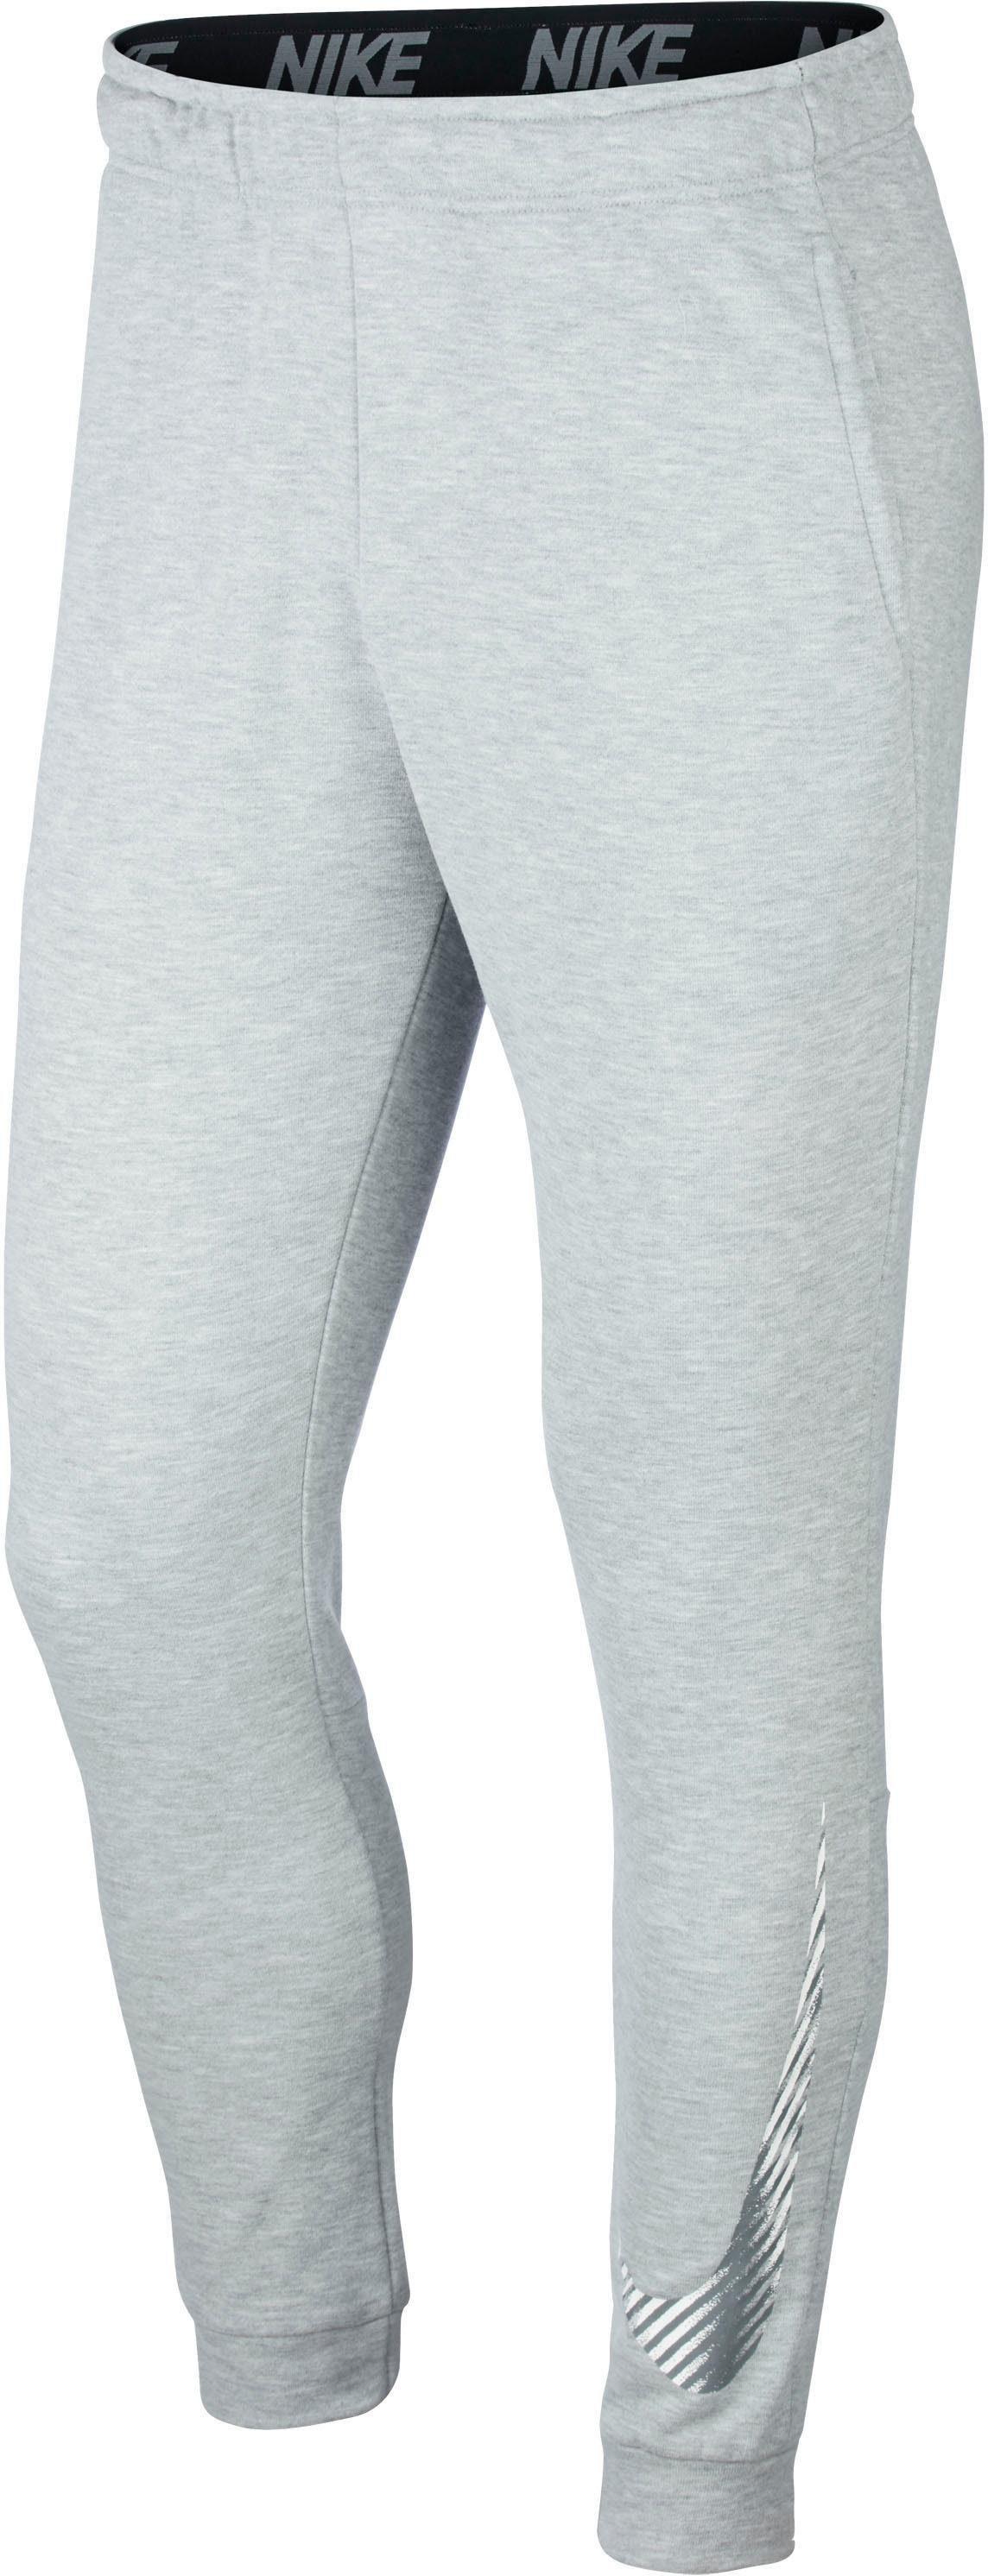 Nike Trainingshose »Nike Dri FIT Men's Fleece Training Pants« Dri FIT Technologie online kaufen | OTTO